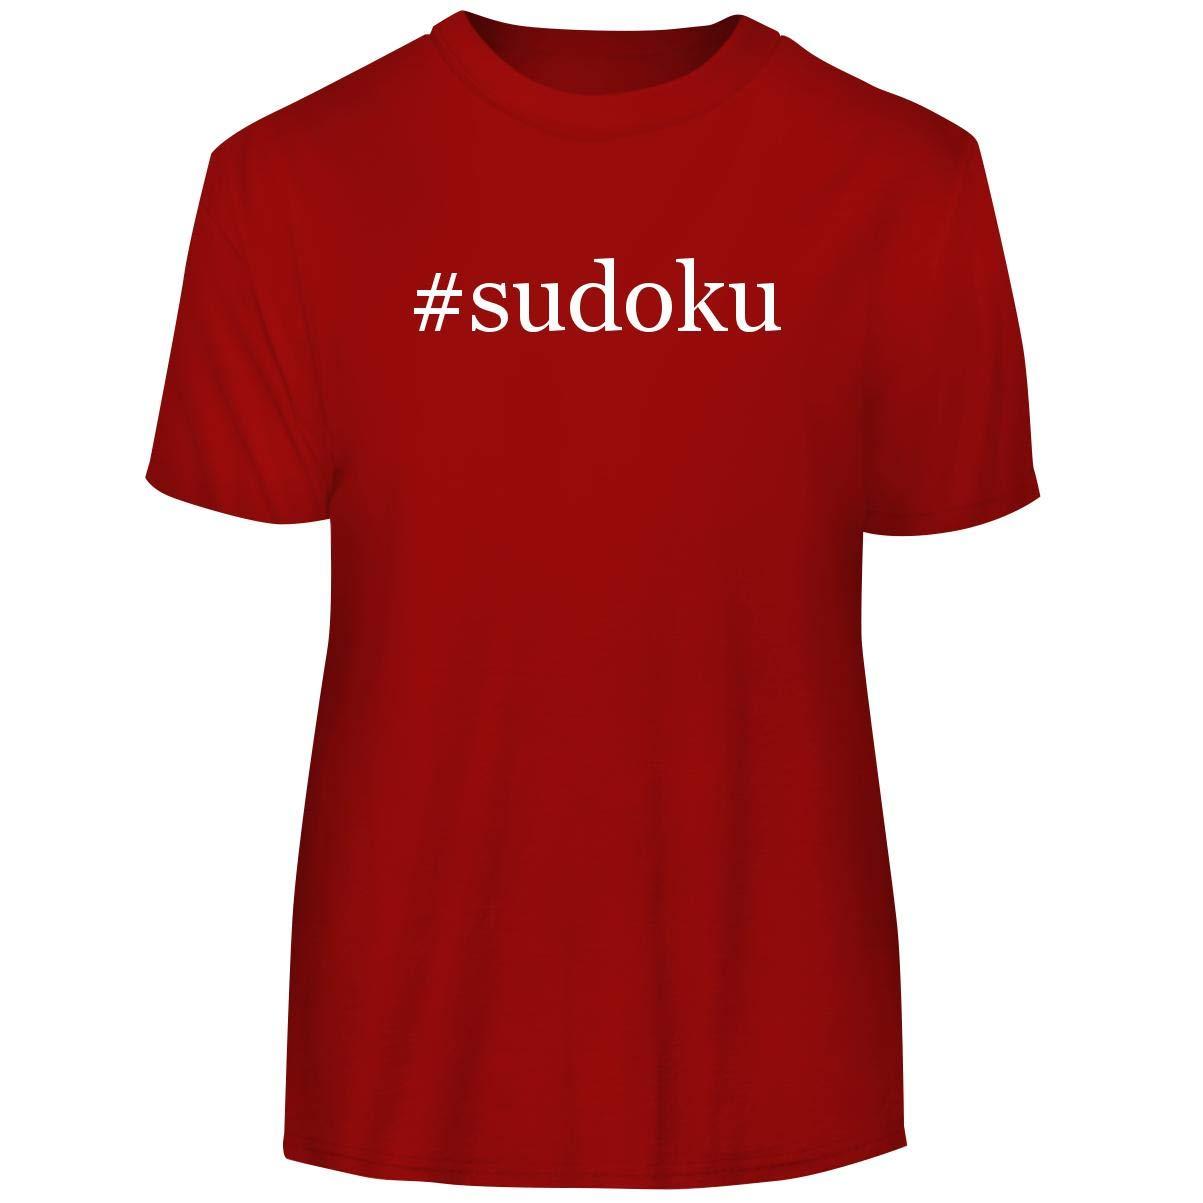 Sudoku Hashtag S Funny Soft Adult Tee Tshirt